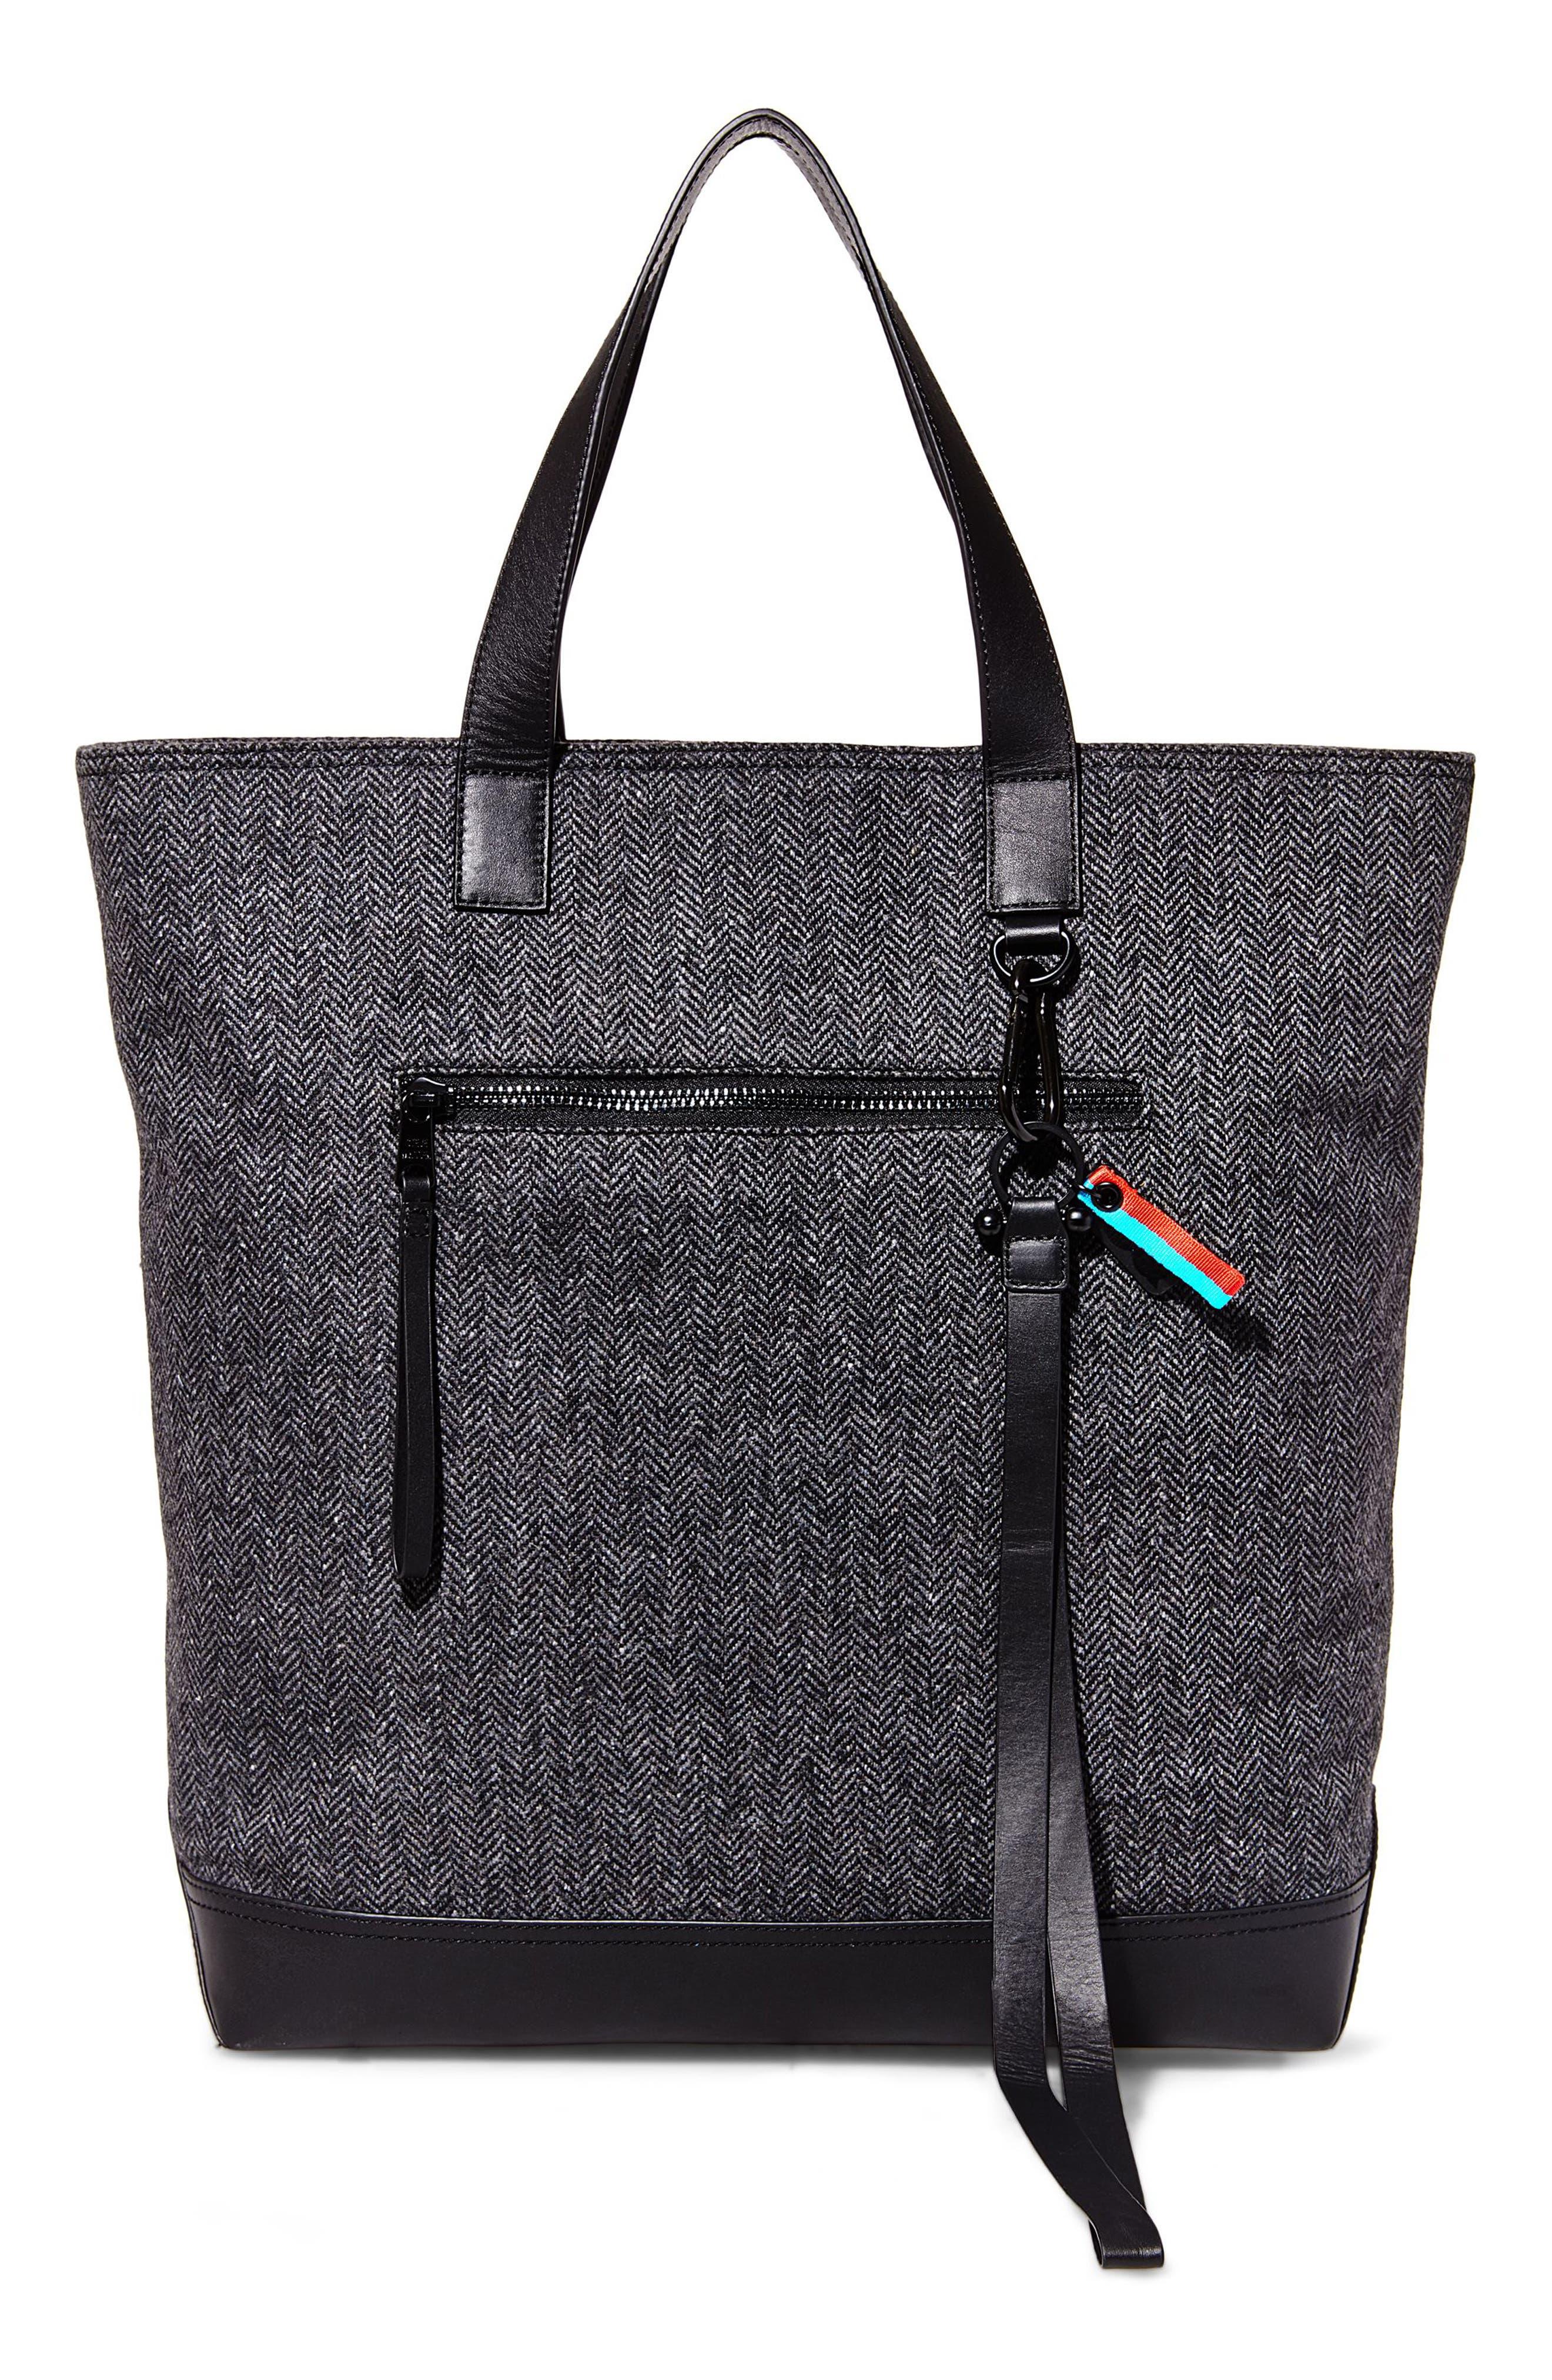 GQ x Steve Madden Tote Bag,                         Main,                         color, 020